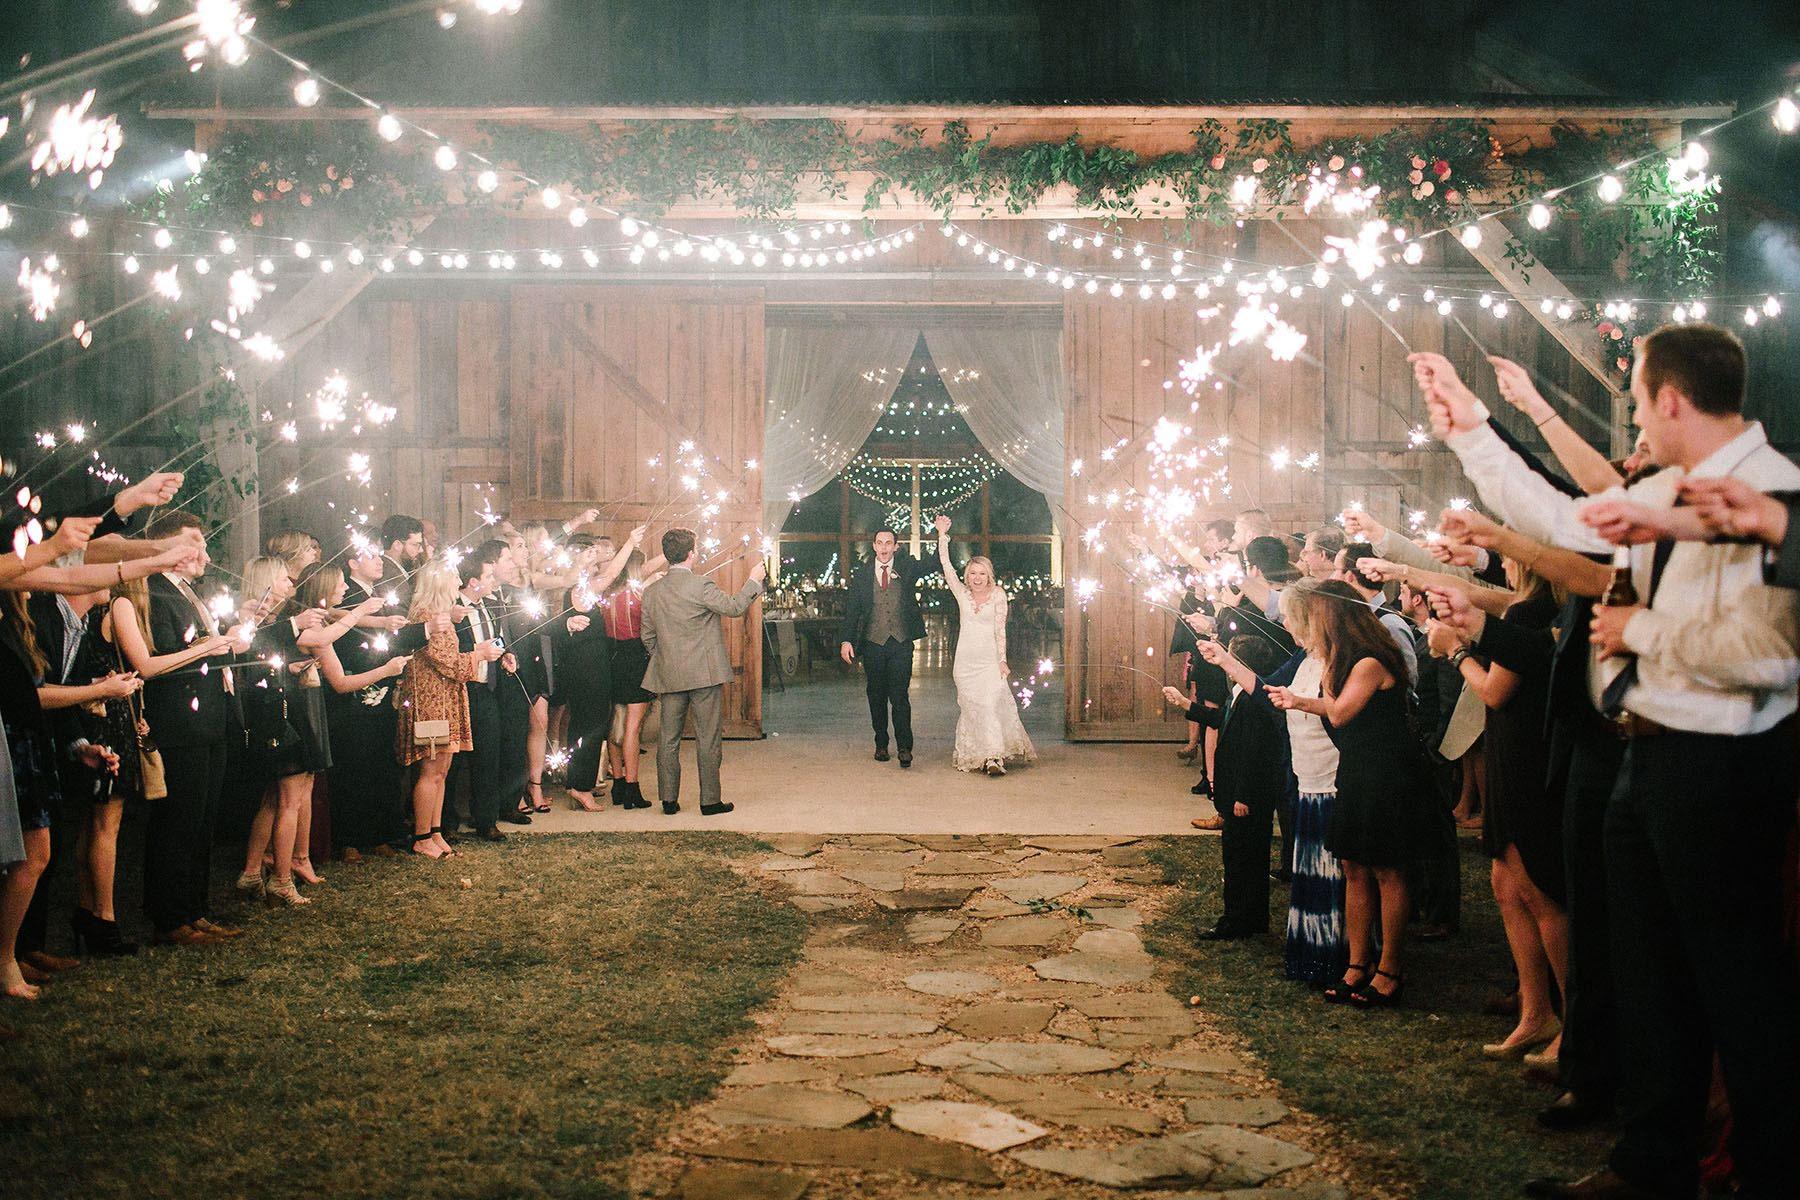 The Best Wedding Venues In Collin County Local Profile Of Collin